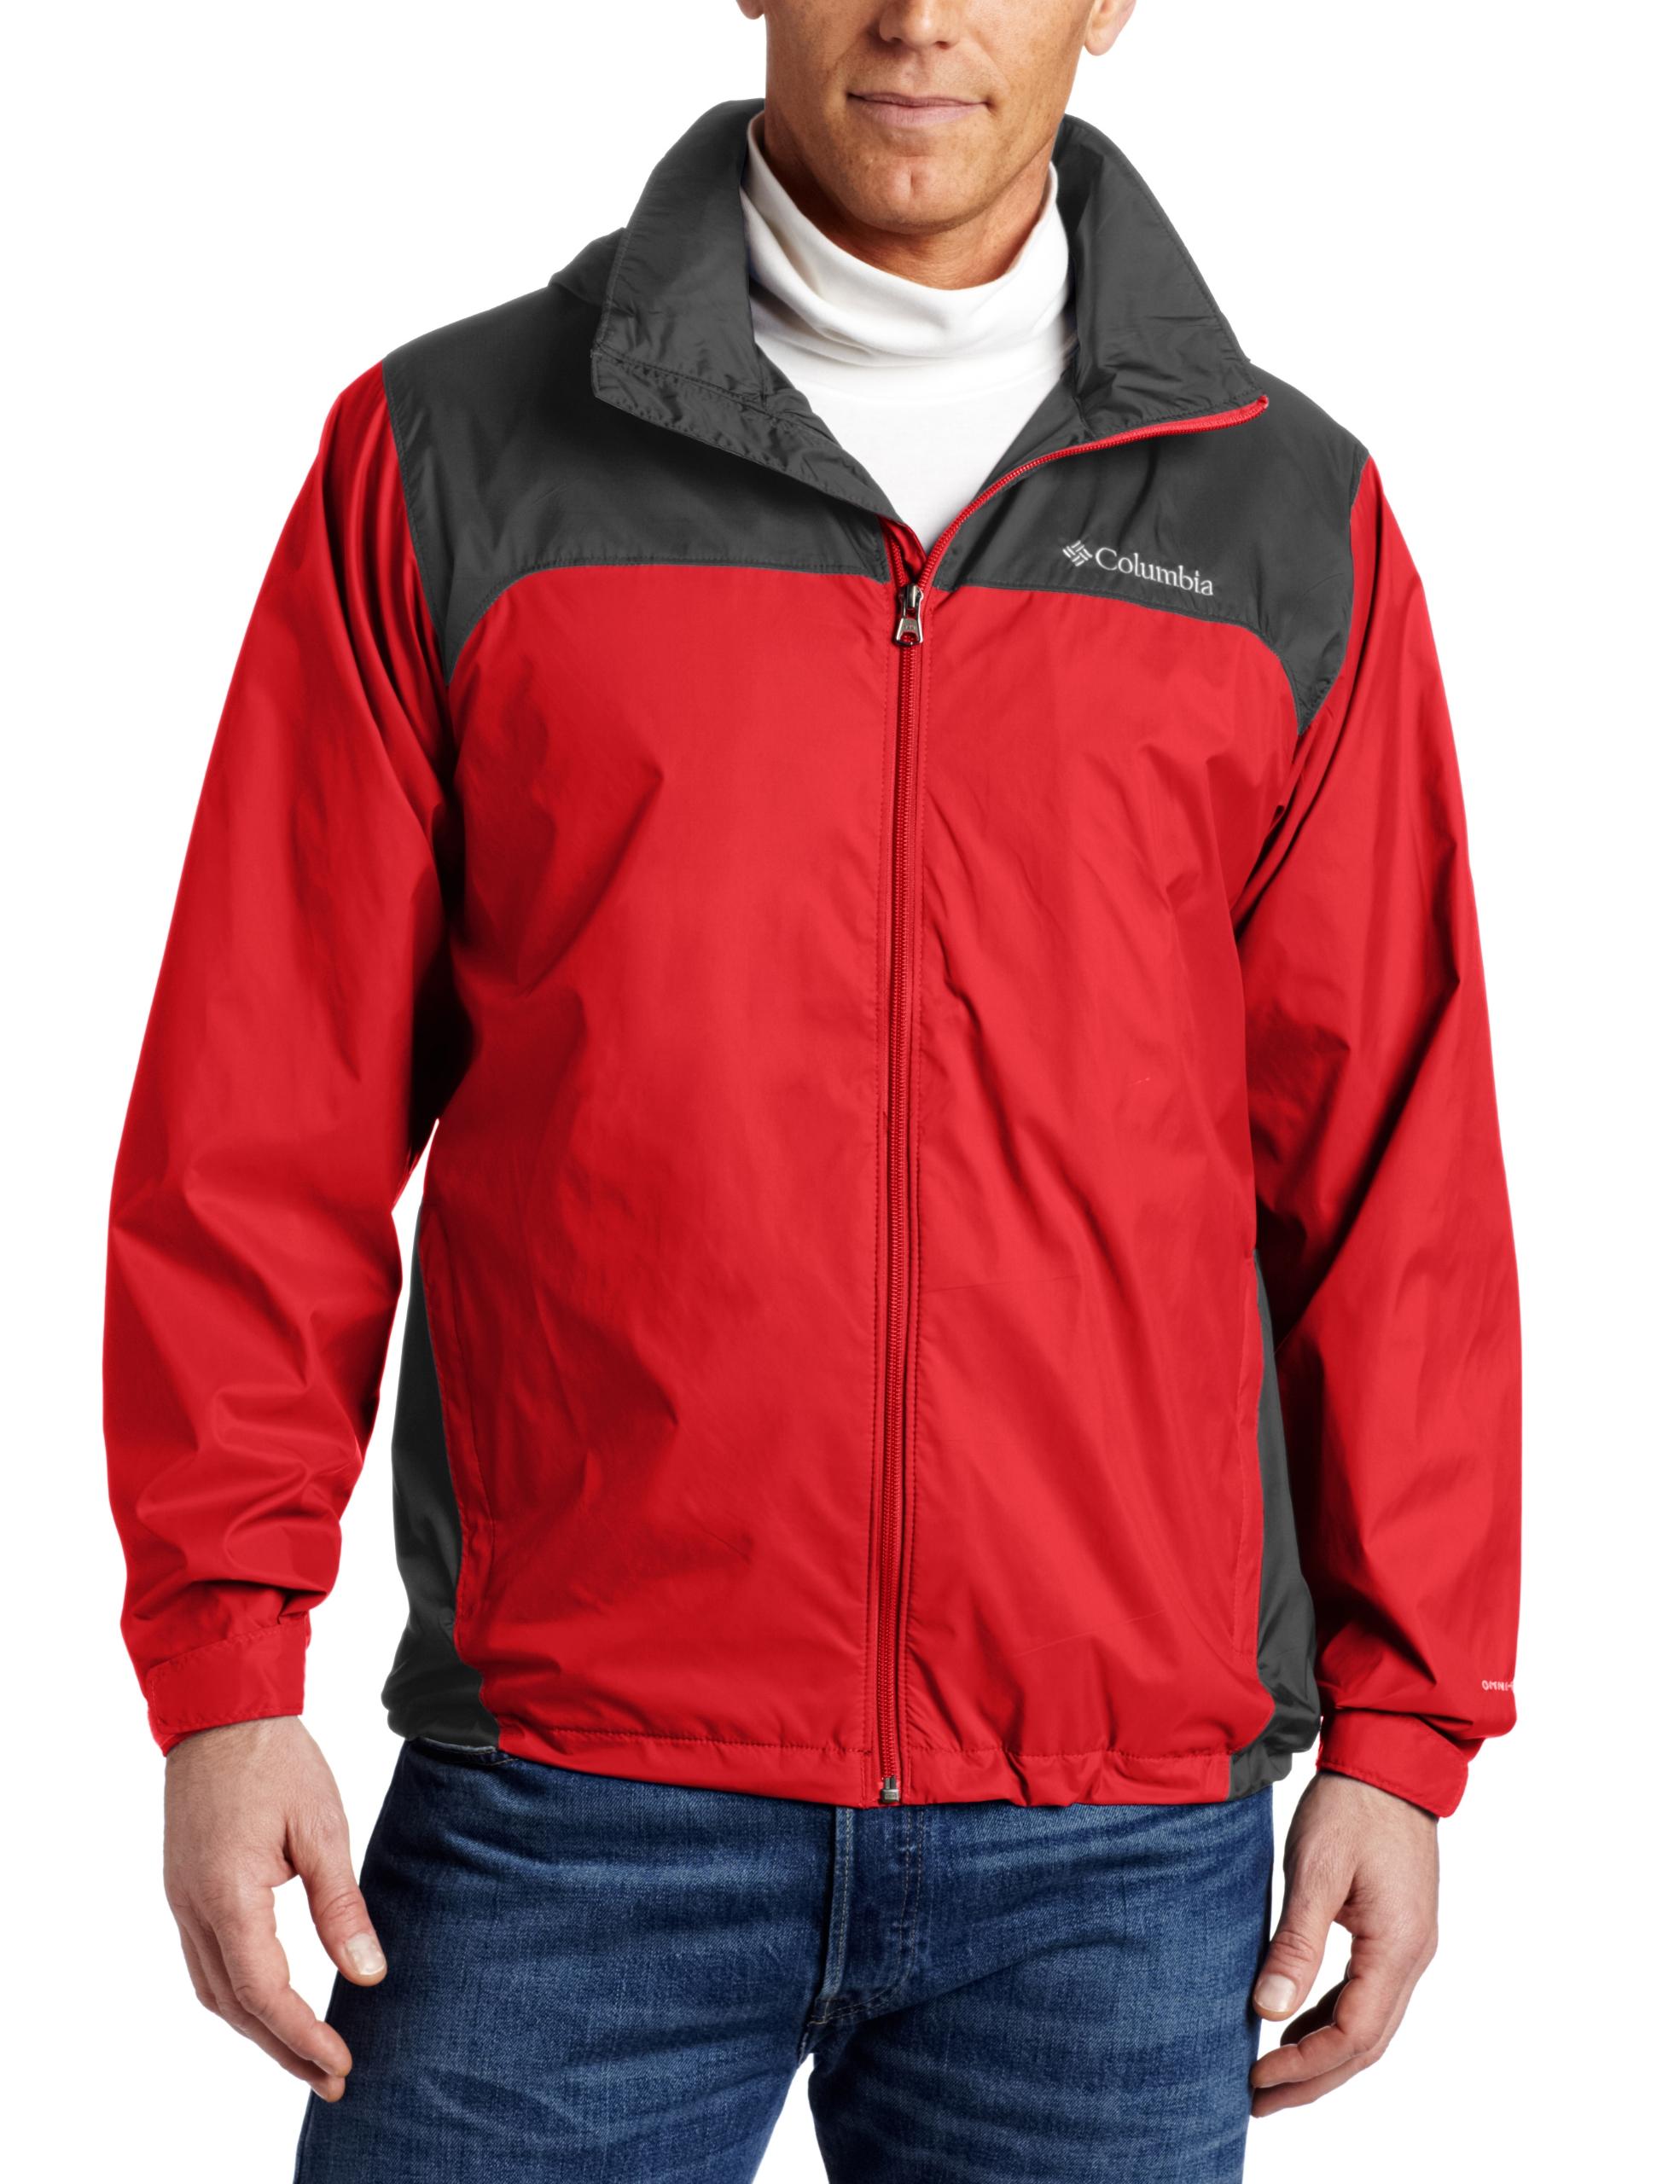 Columbia Men's Big & Tall Glennaker Lake Packable Rain Jacket,Bright Red/Grill,Tall/Large